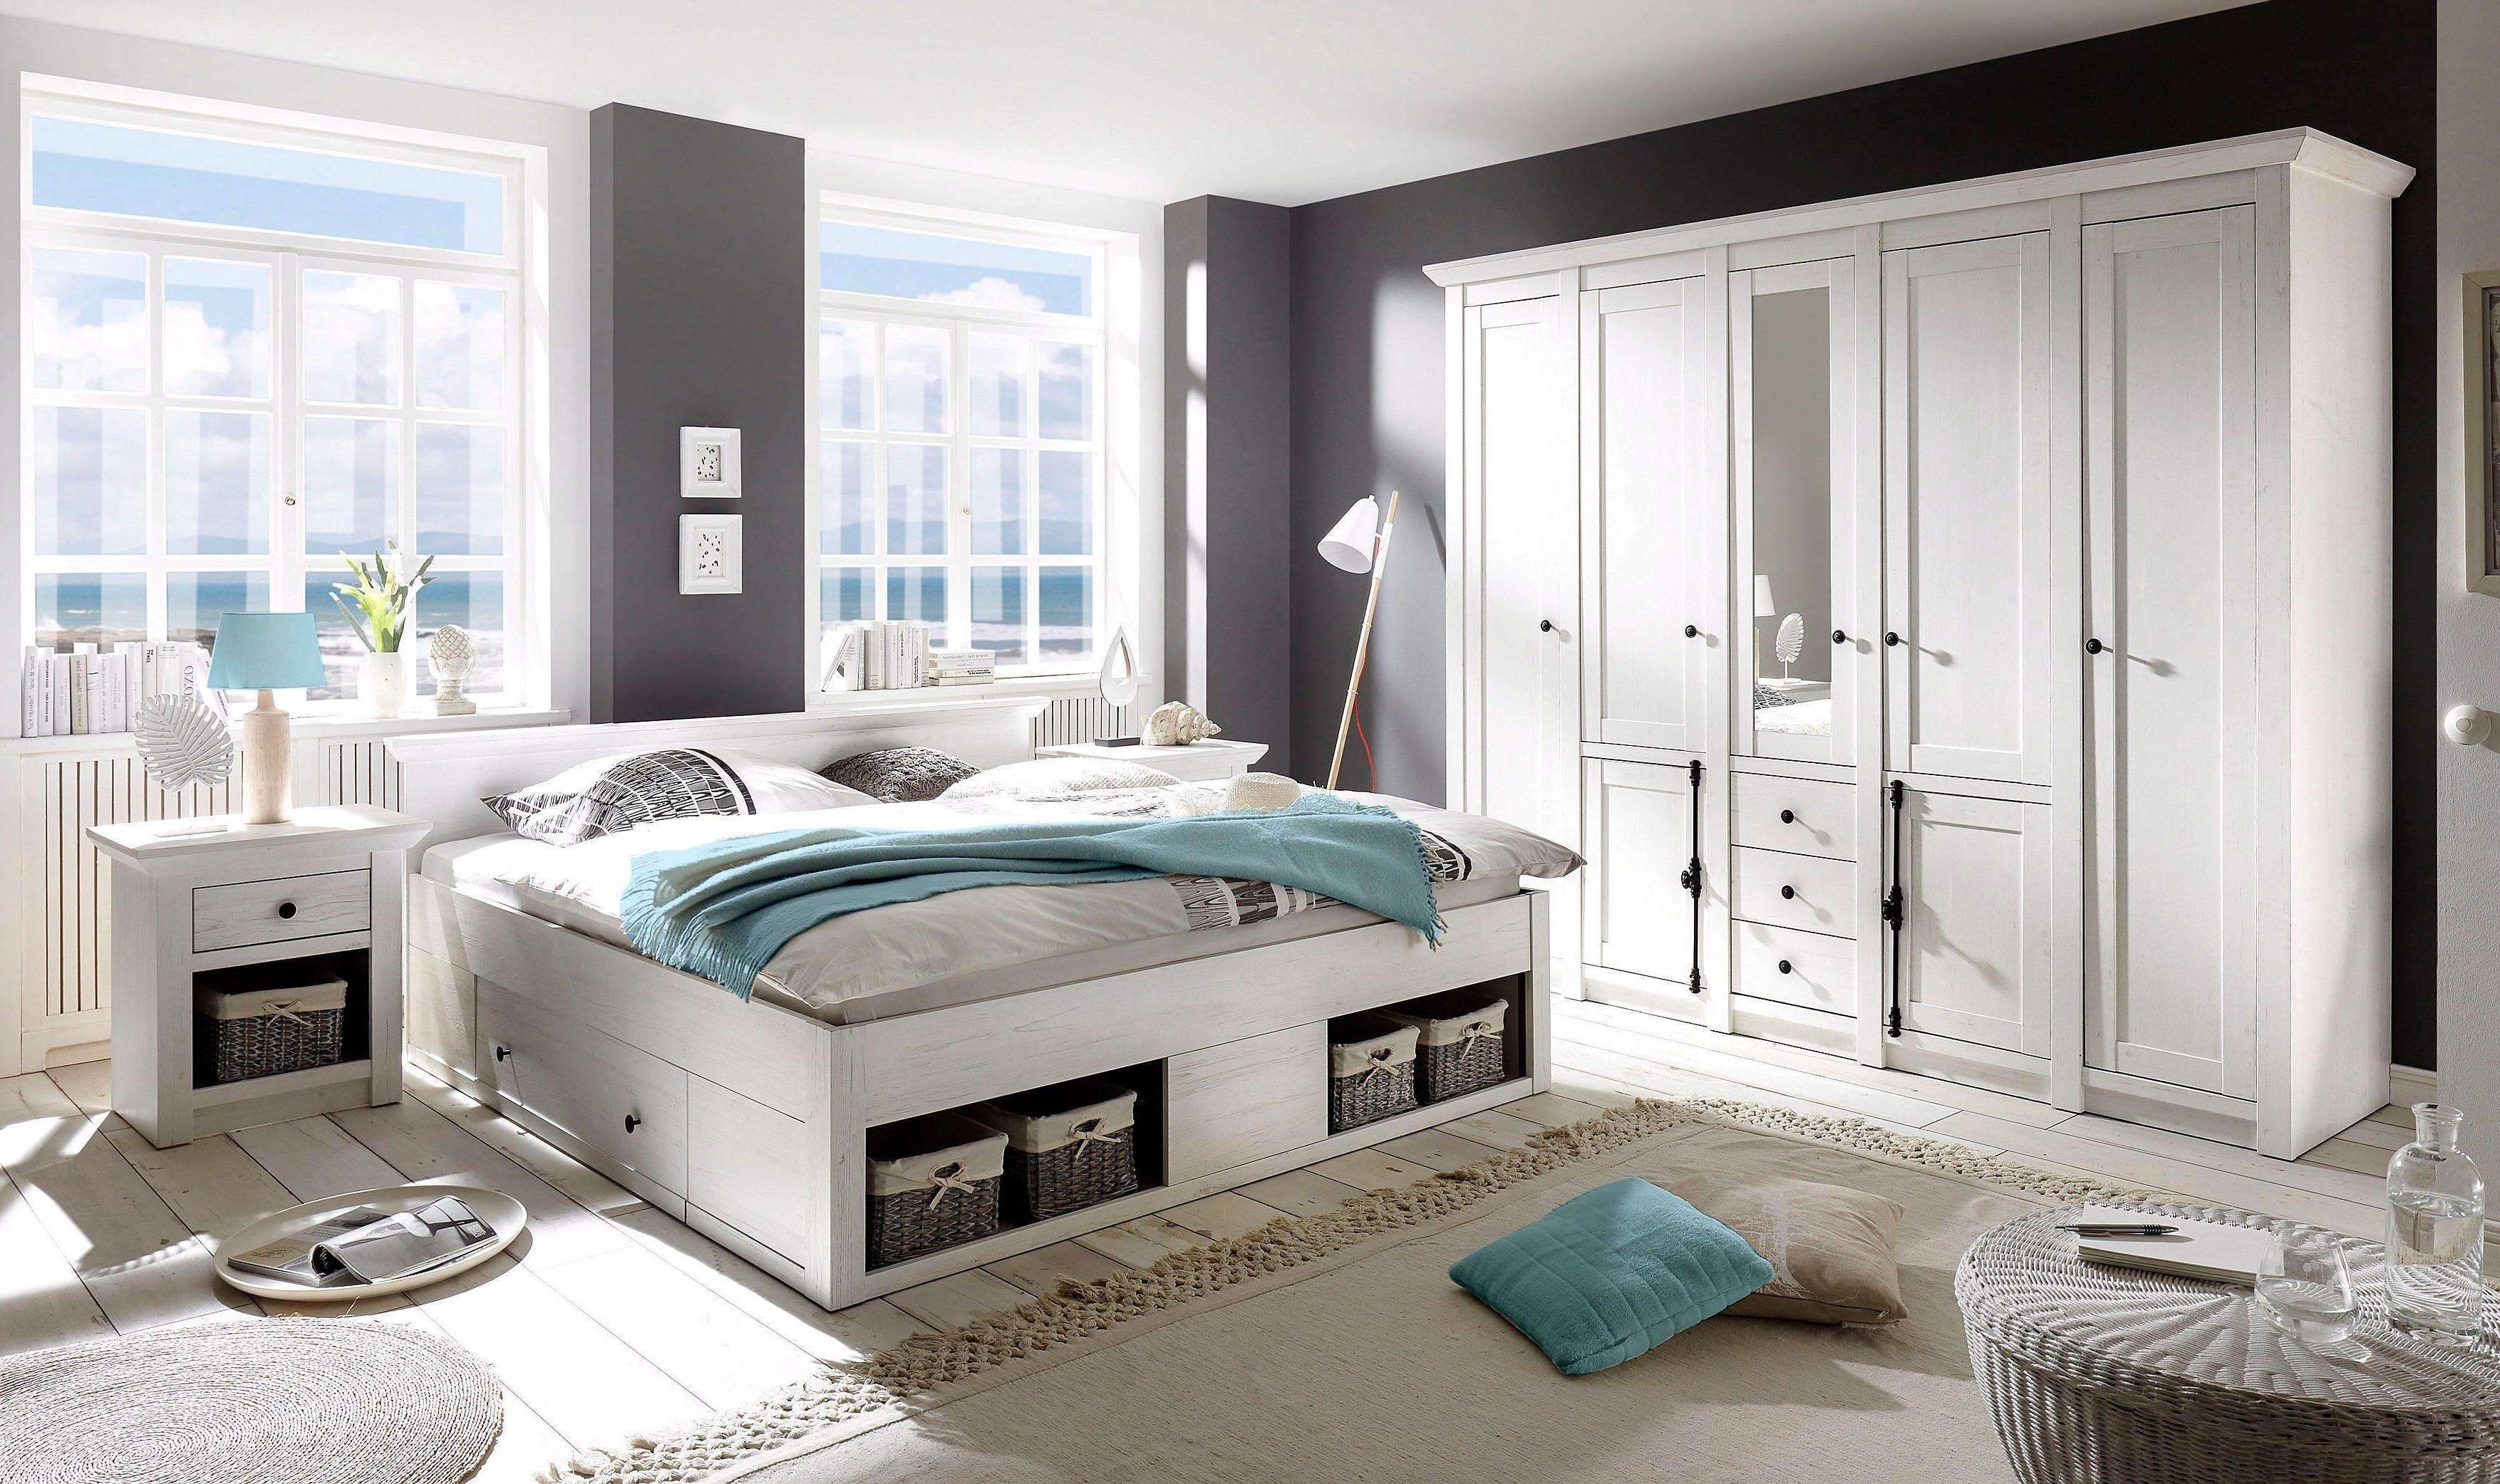 Van Ledikant Naar Groot Bed.Home Affaire Slaapkamerserie California Groot Bed 180 Cm 2